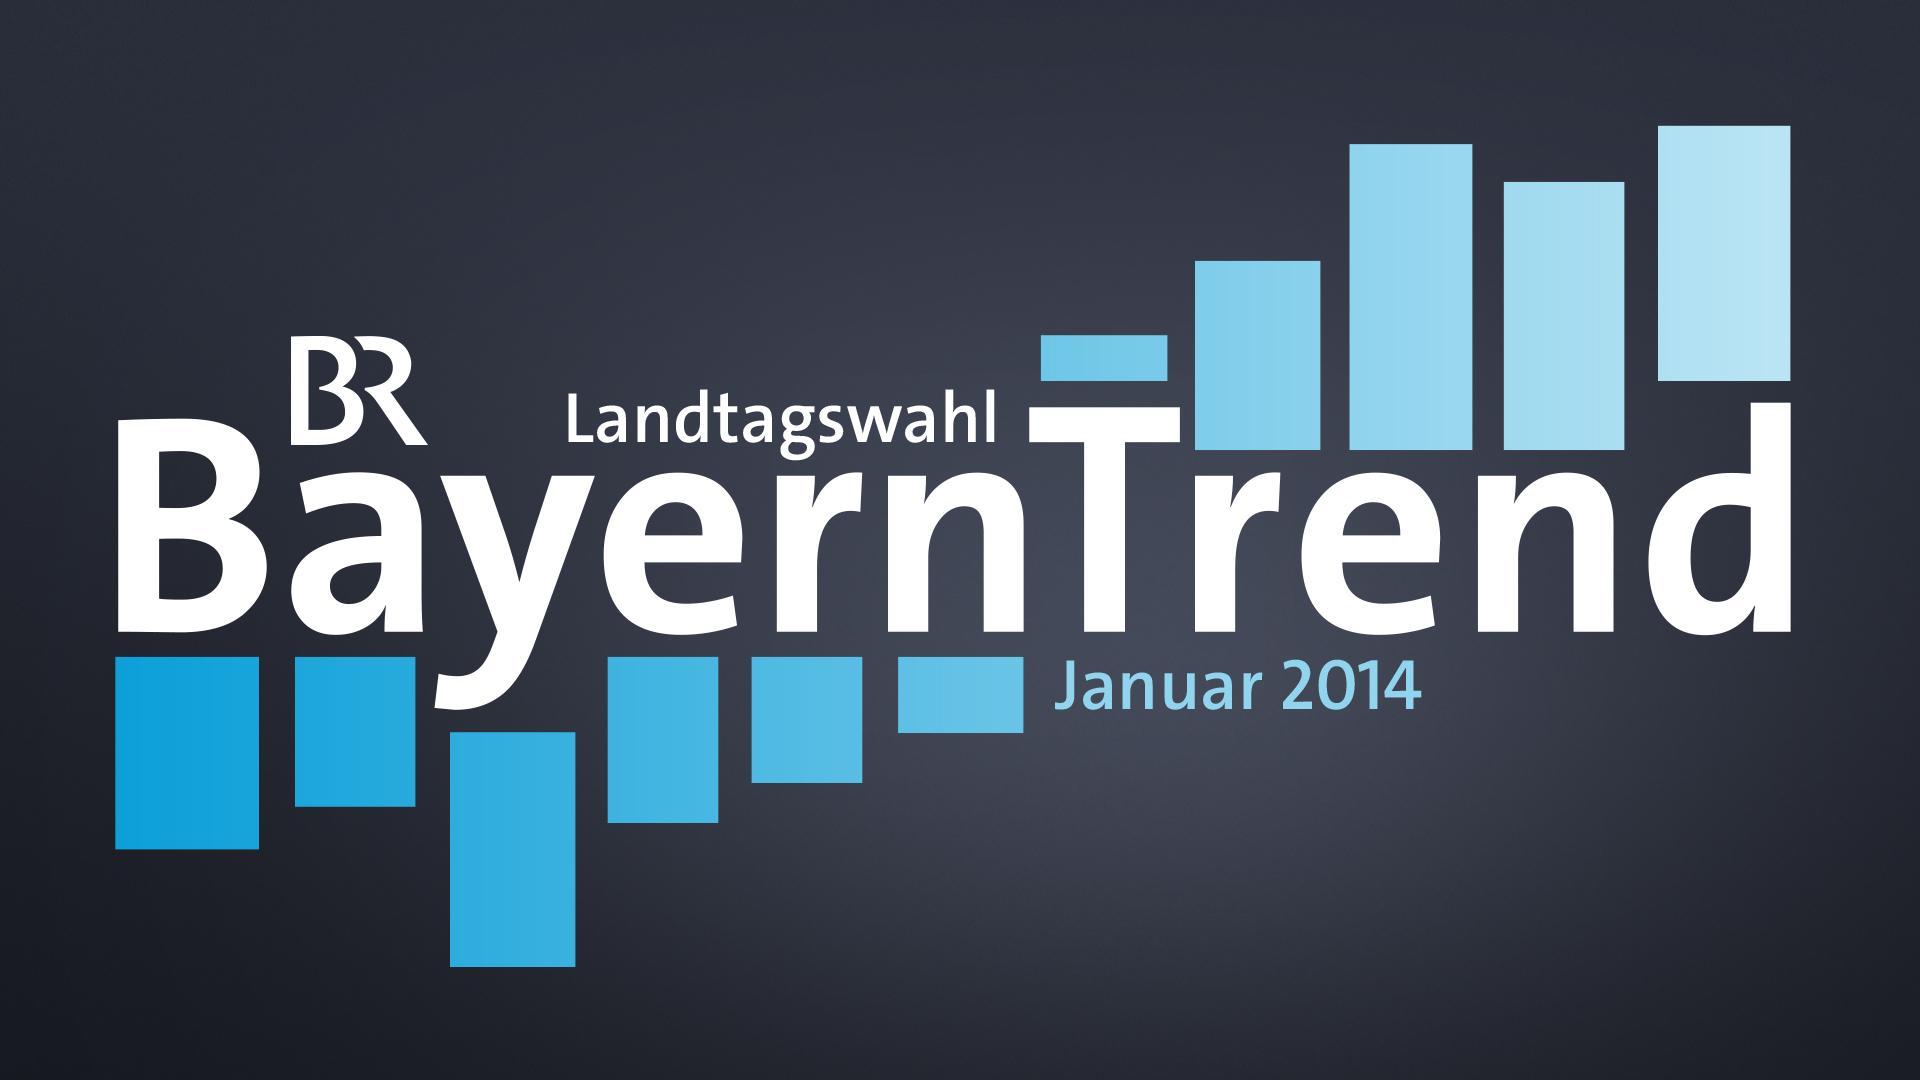 BayernTrend 2014: